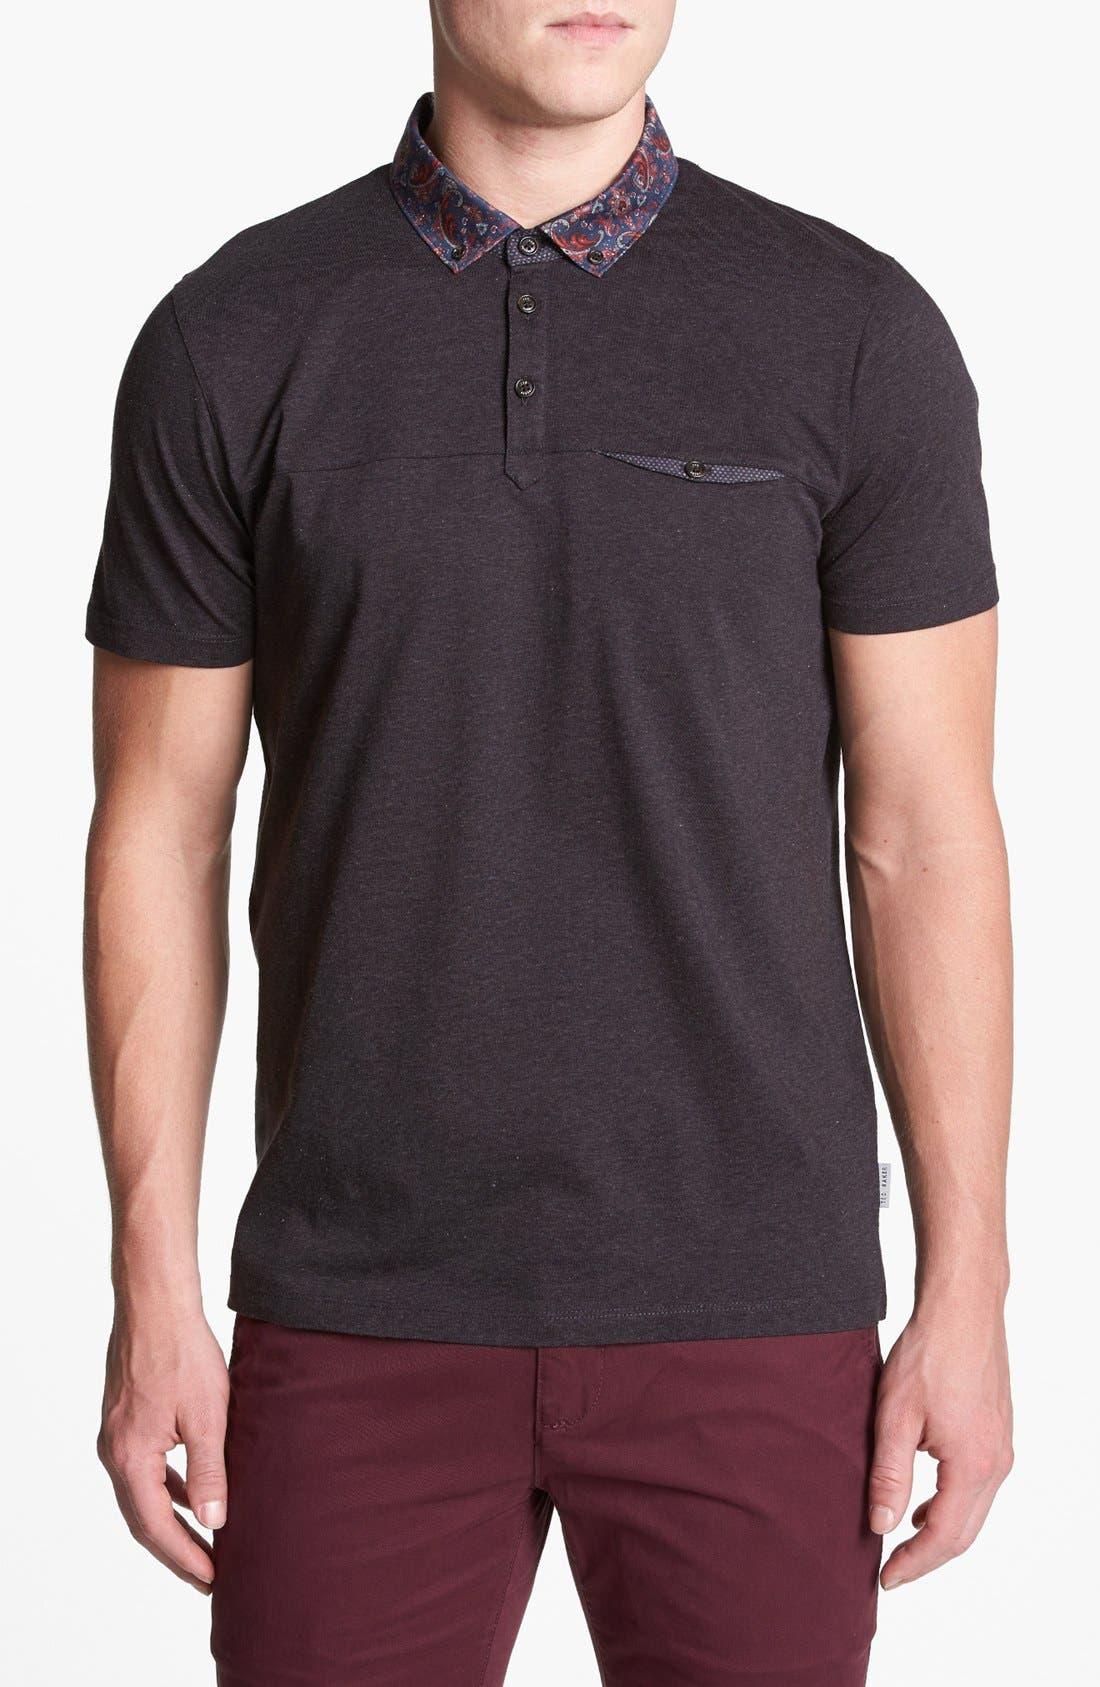 Alternate Image 1 Selected - Ted Baker London Woven Collar Polo Shirt